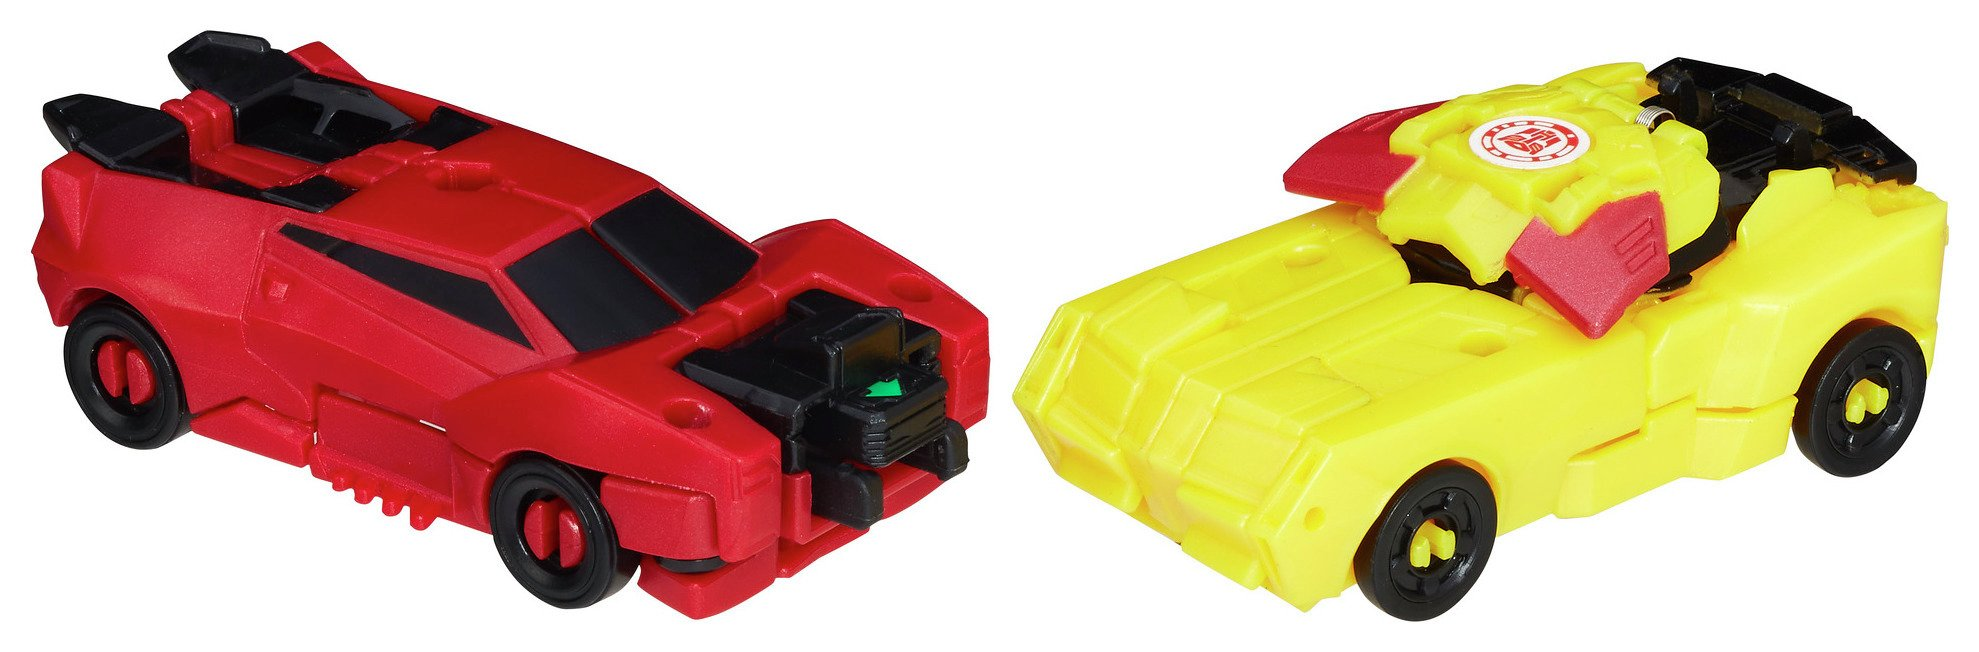 Image of Transformers Robots In Disguise Crash Combiner Bumblebee